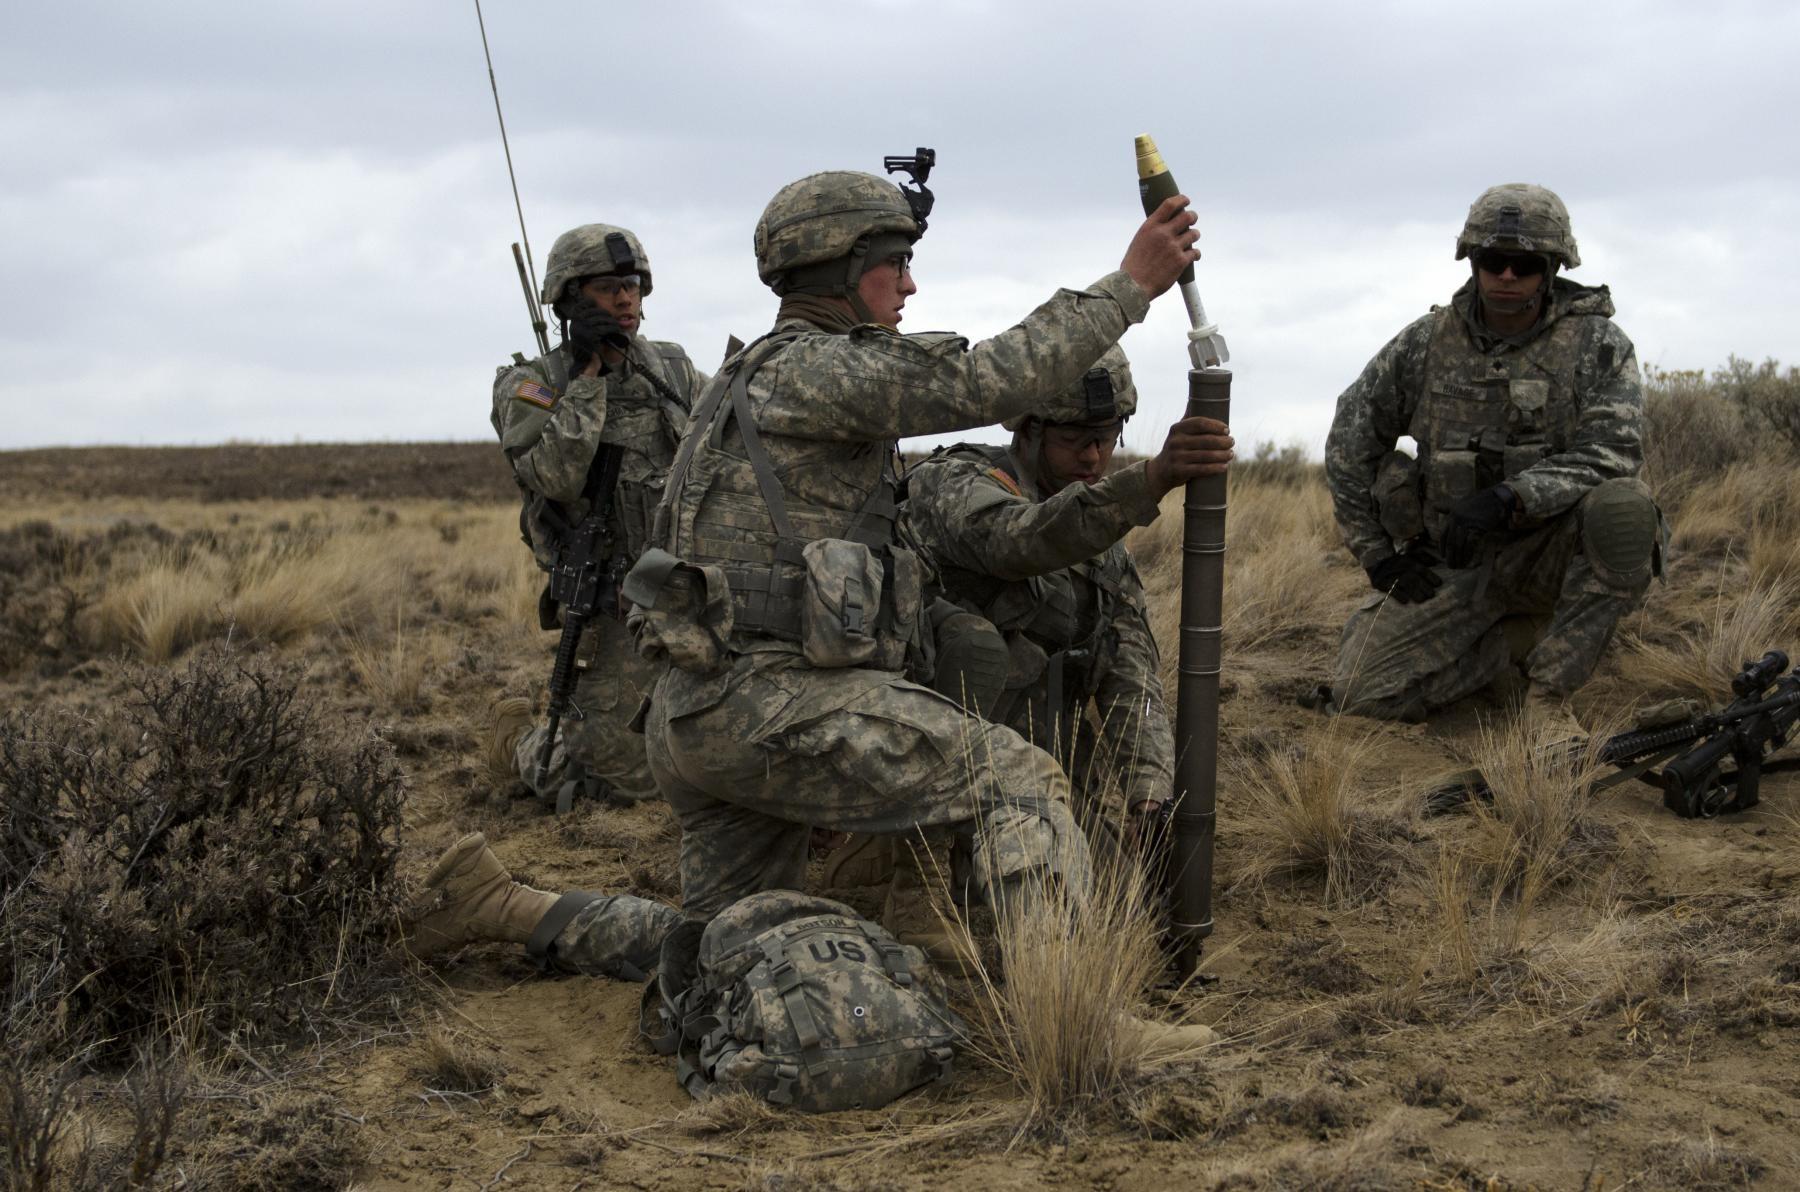 U S Army Heavy Mortar Platoon : Tomahawks mortar platoon trains for conventional fight